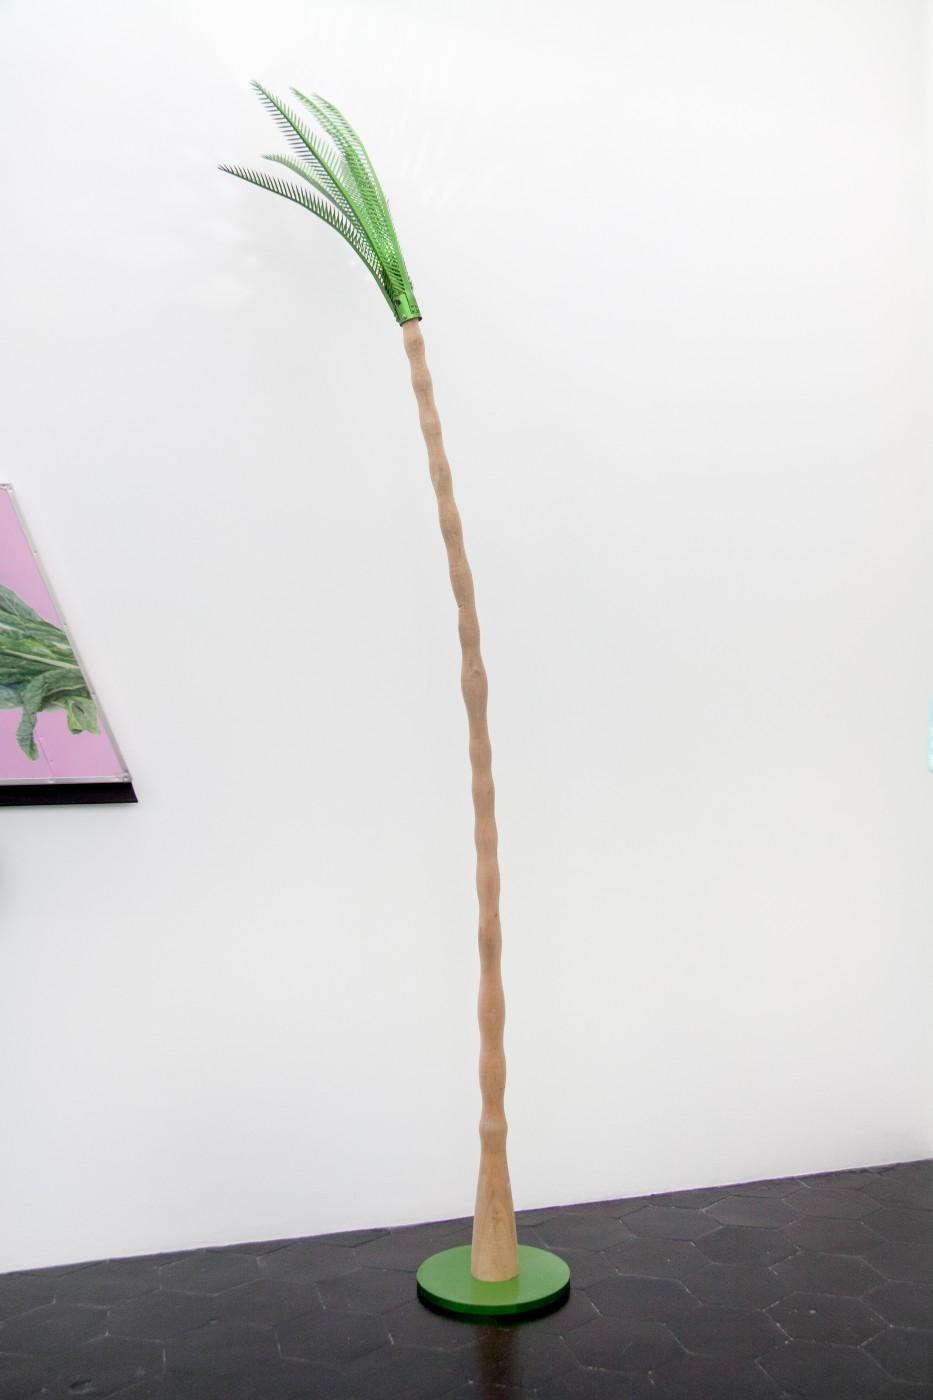 Wind Parade  Hurricane Palm , 2014   Poplar, aluminum, rechargeable LED light  245 x 60 x 55 cm / 96.5 x 23.6 x 19.7 in     Pentti Monkkonen